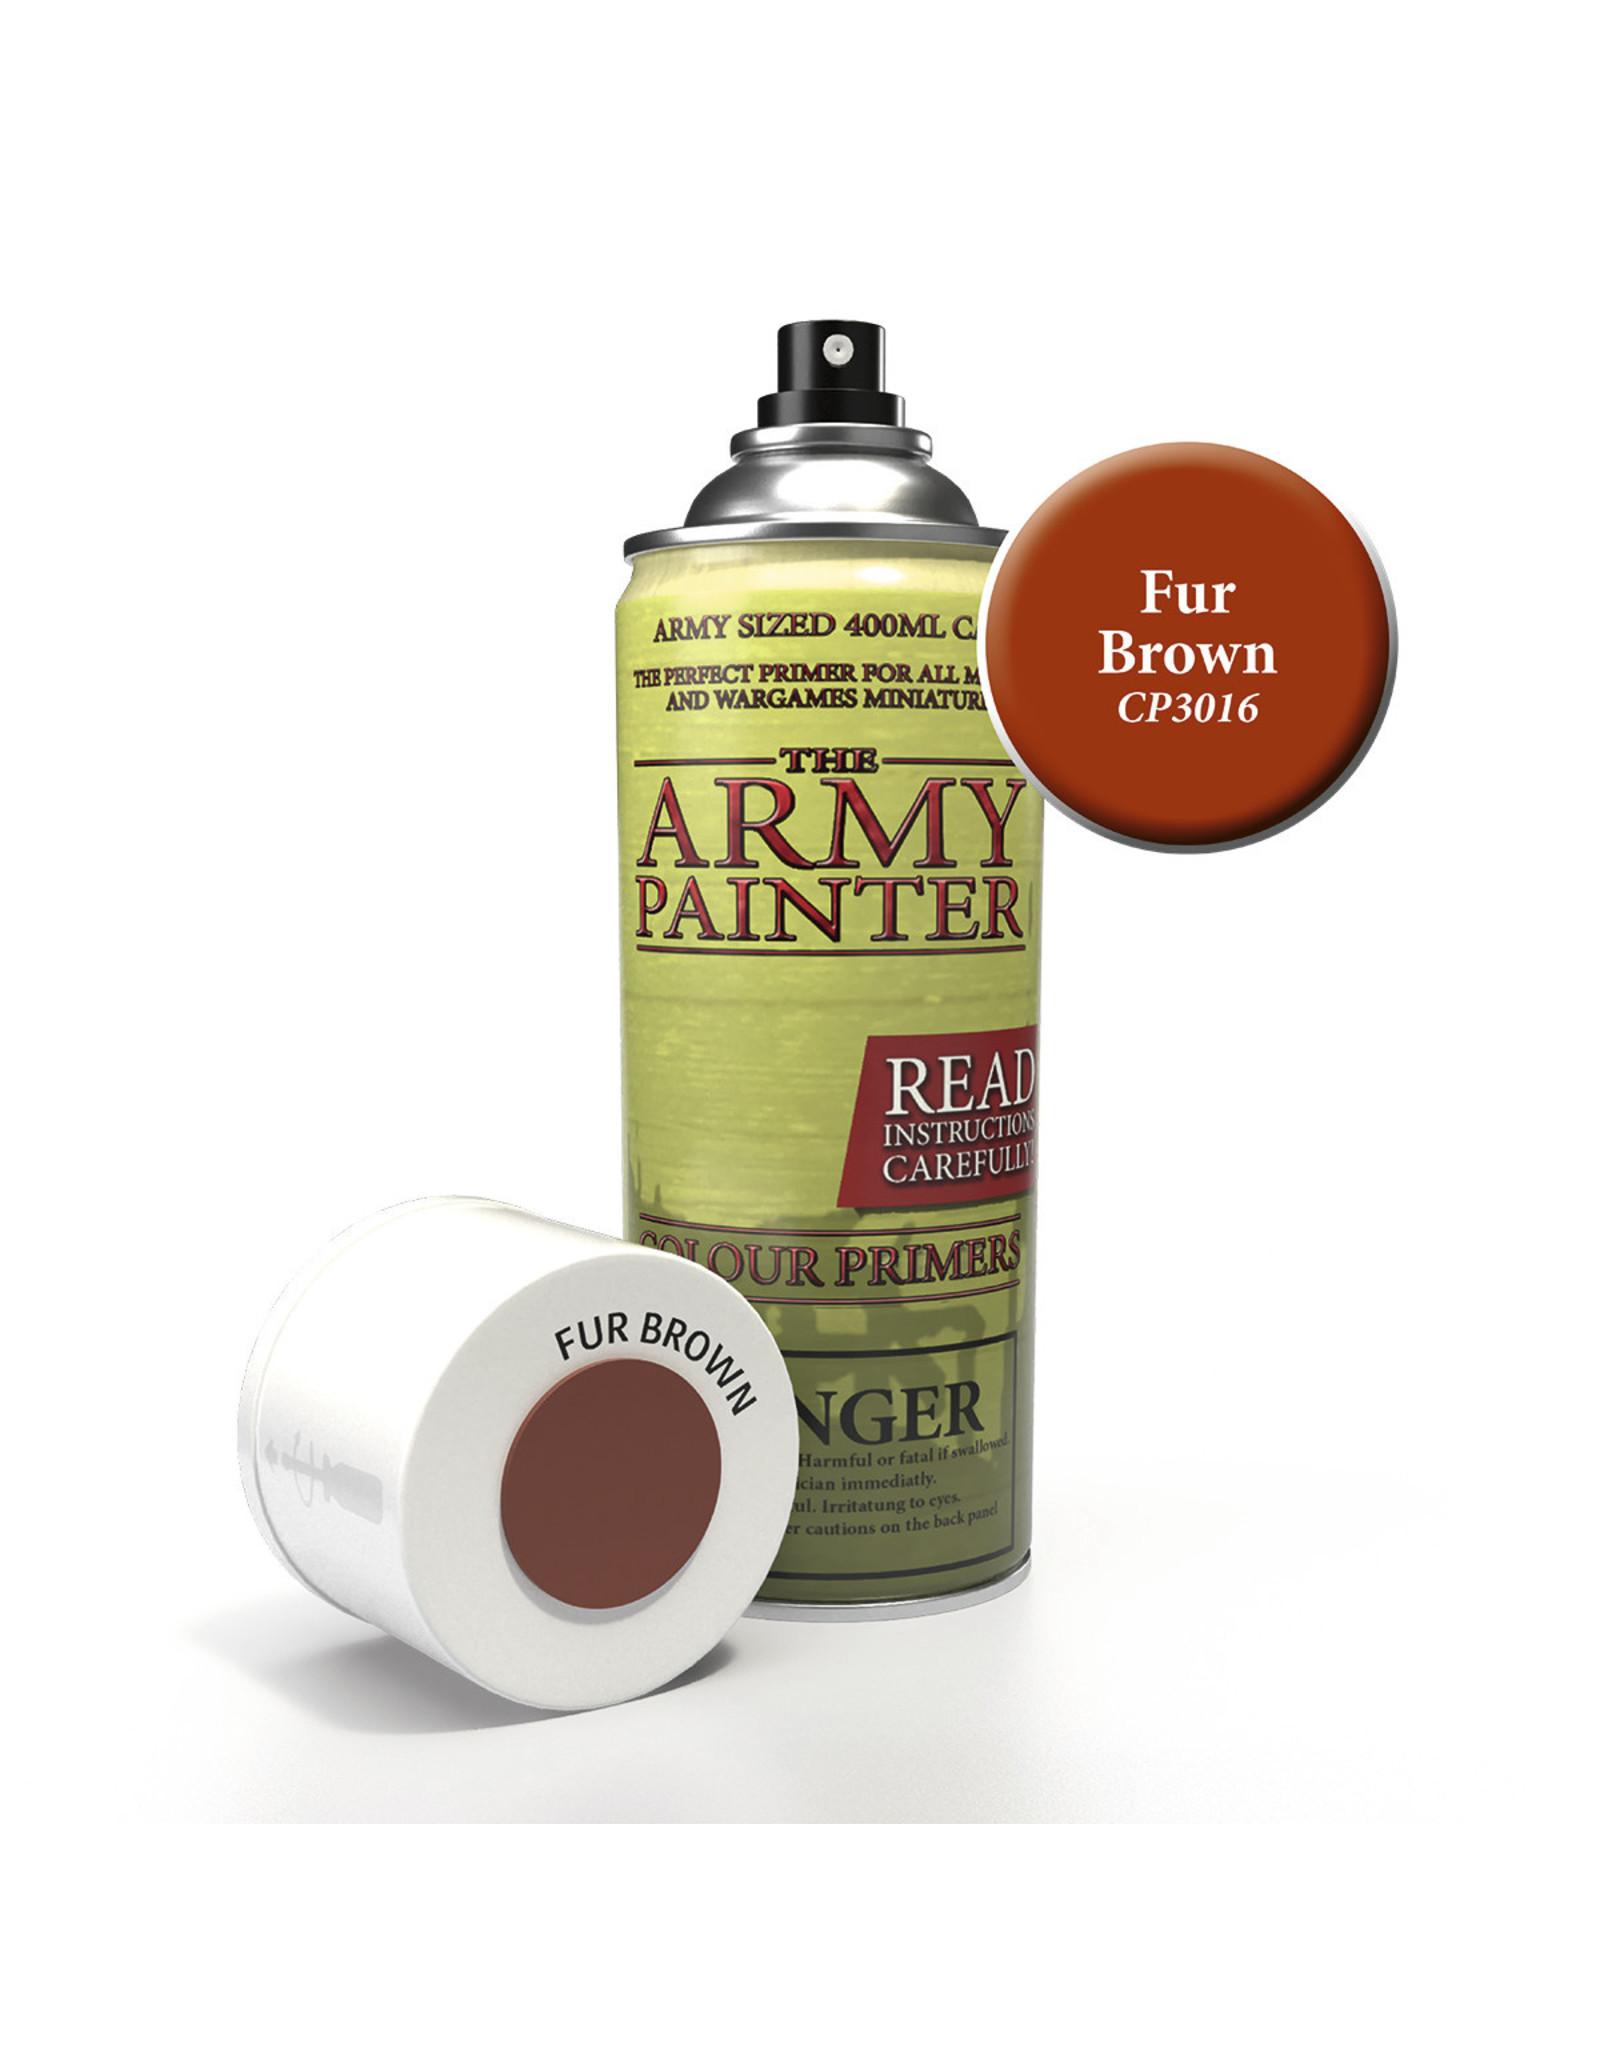 TAP Colour Primer: Fur Brown